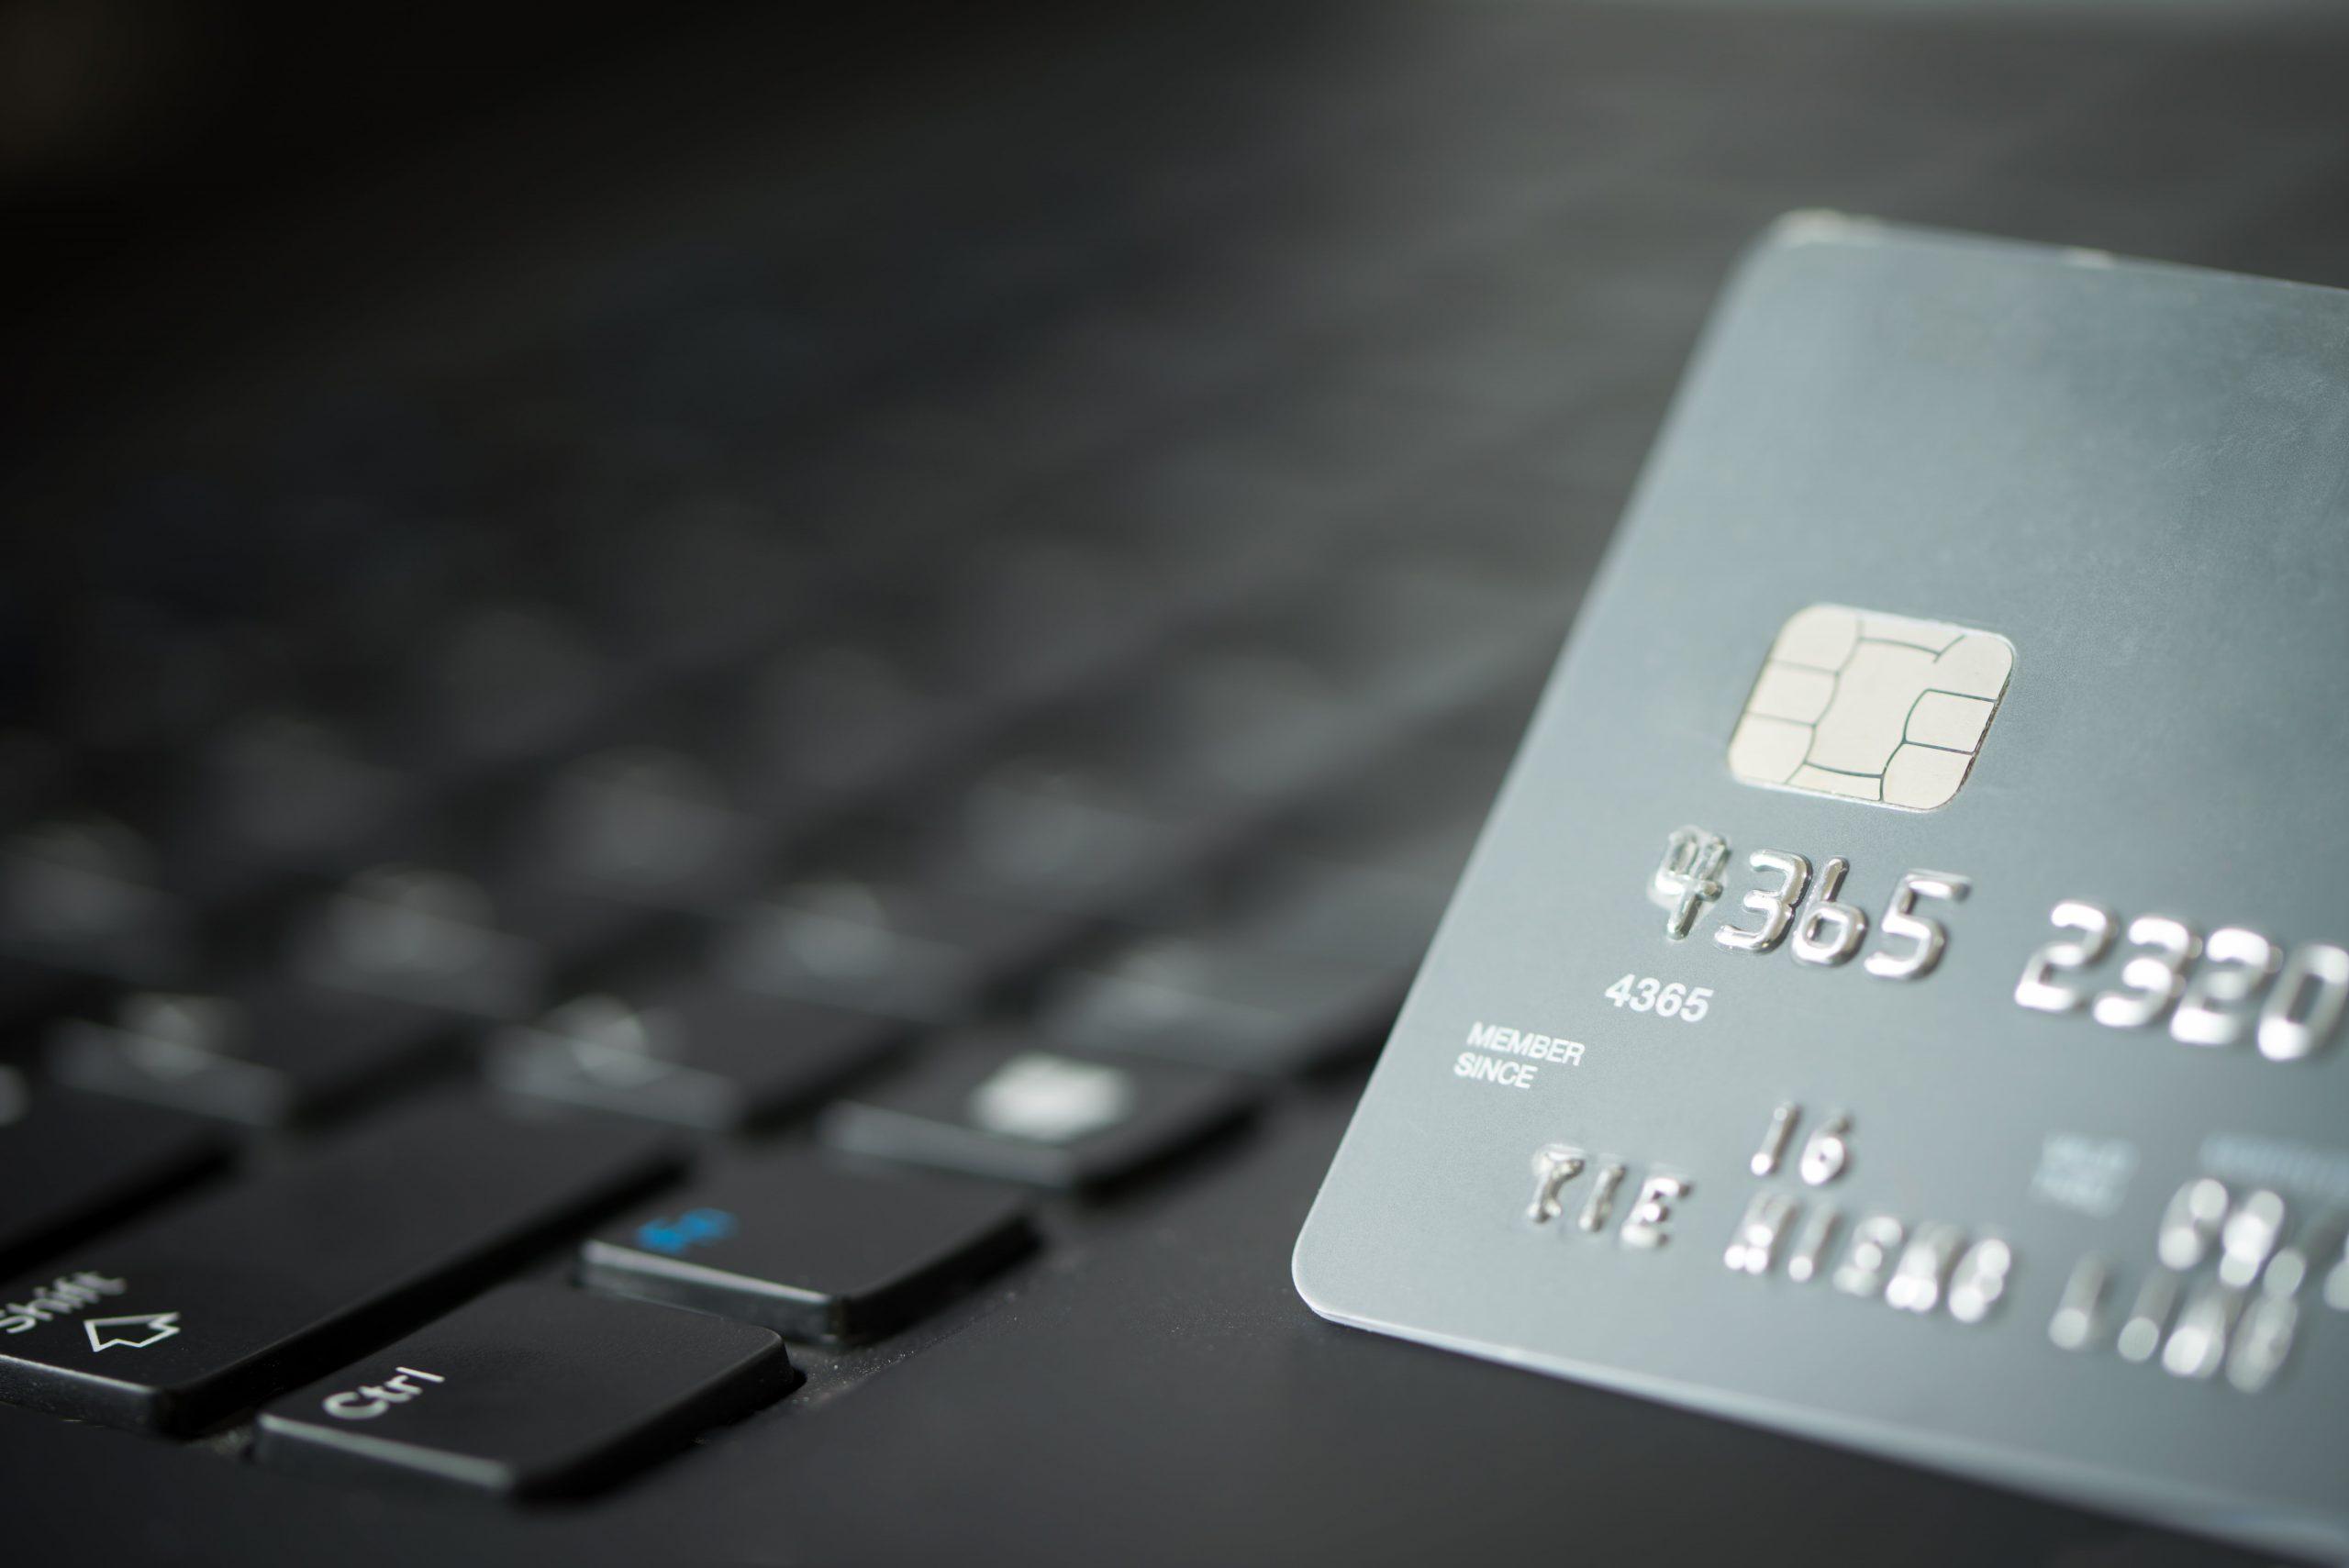 credit-card-on-laptop-PREJC57-min